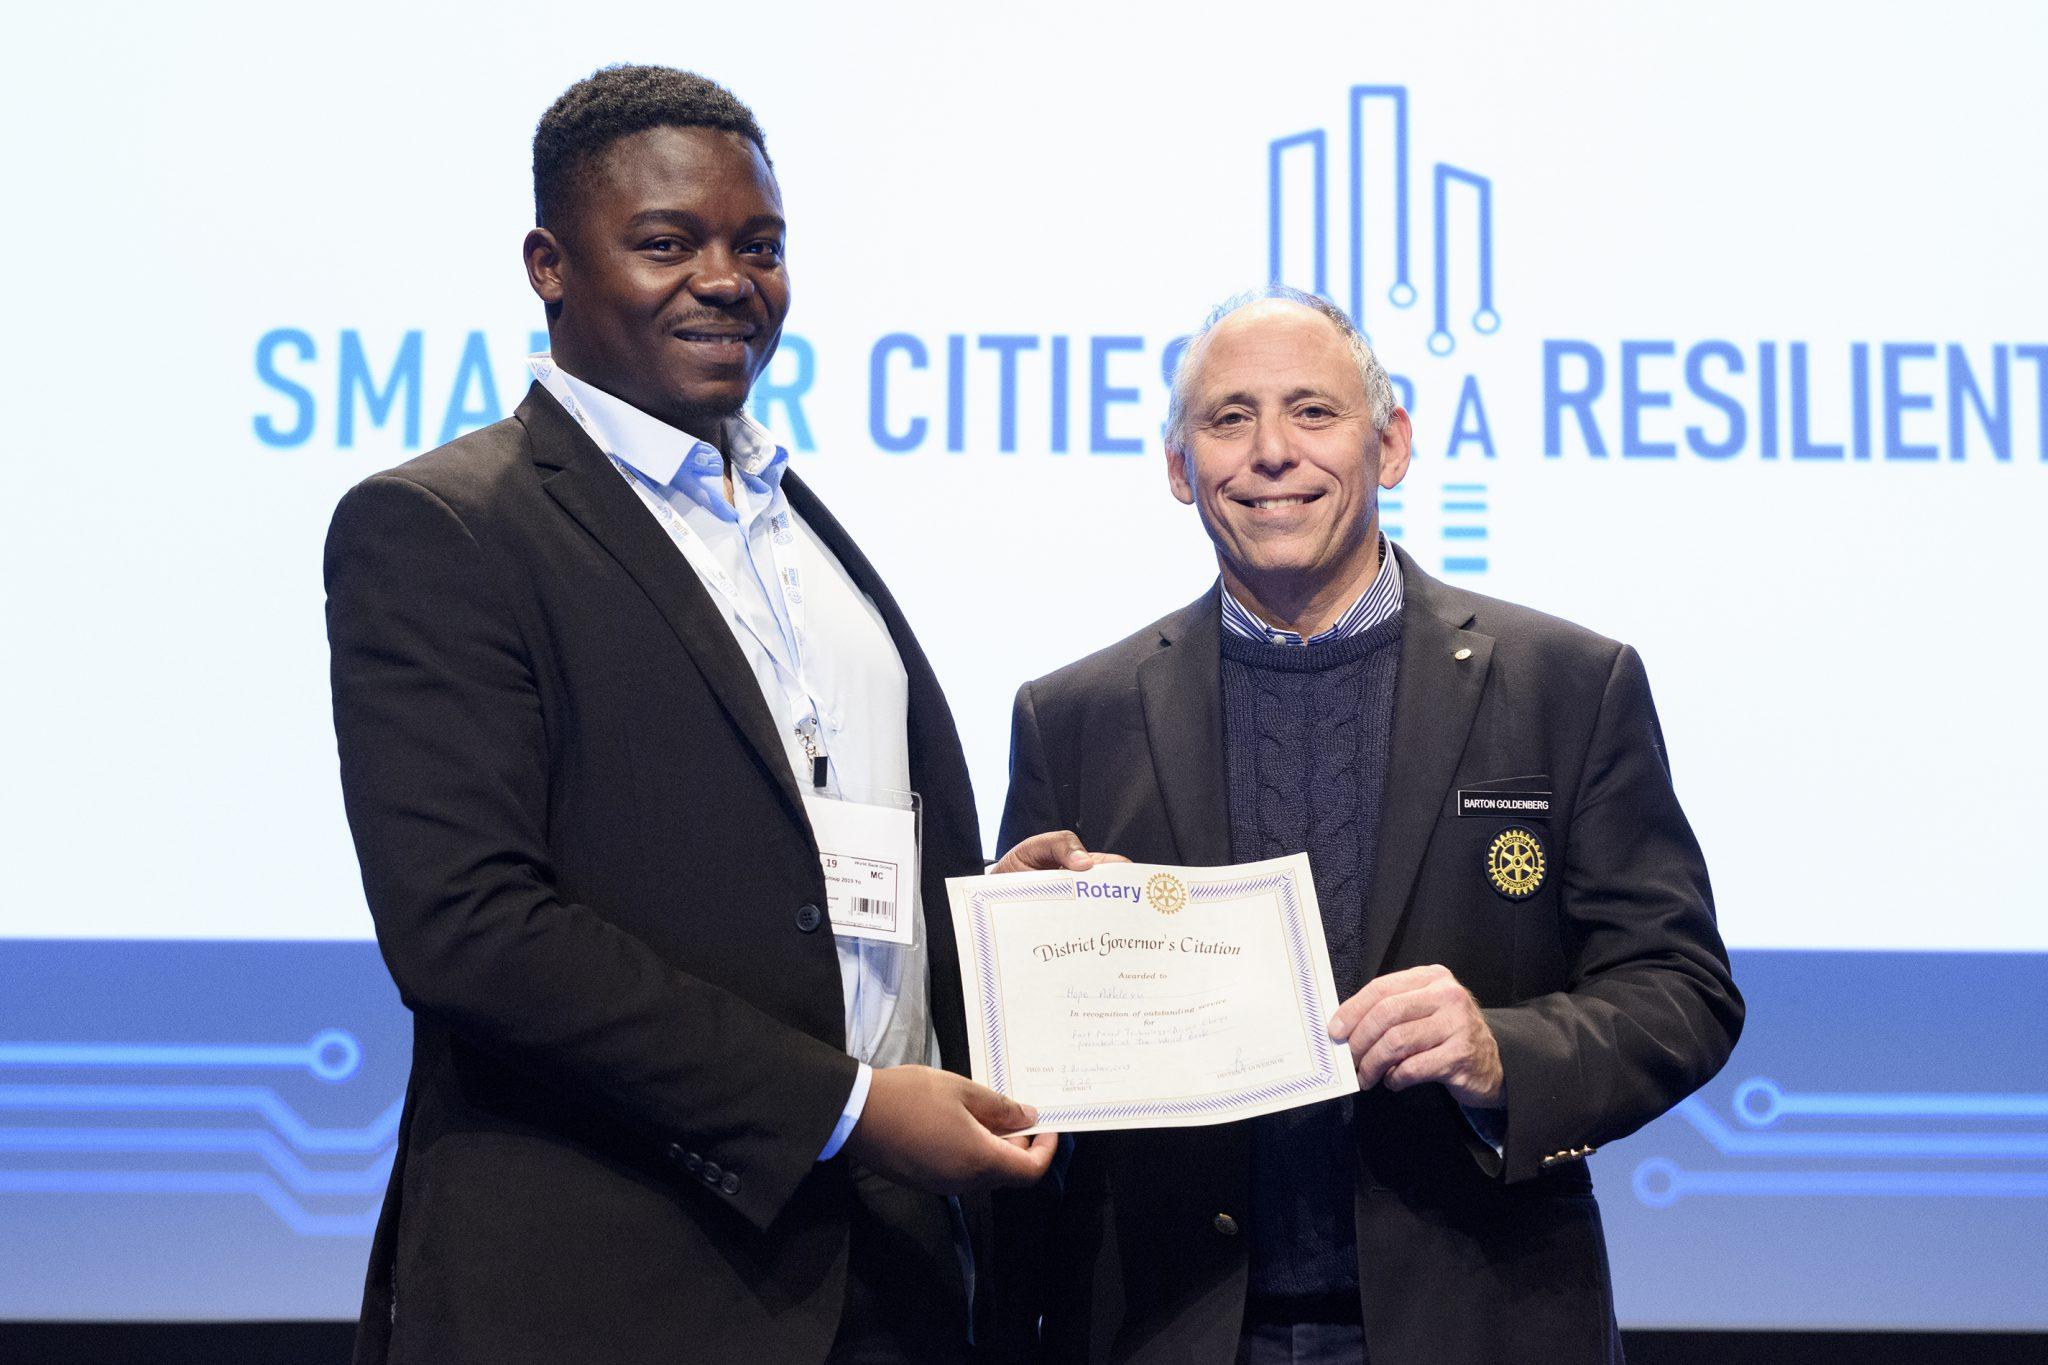 World Bank Youth Summit Award CeremonyRotary Intl Award for Tuverl.